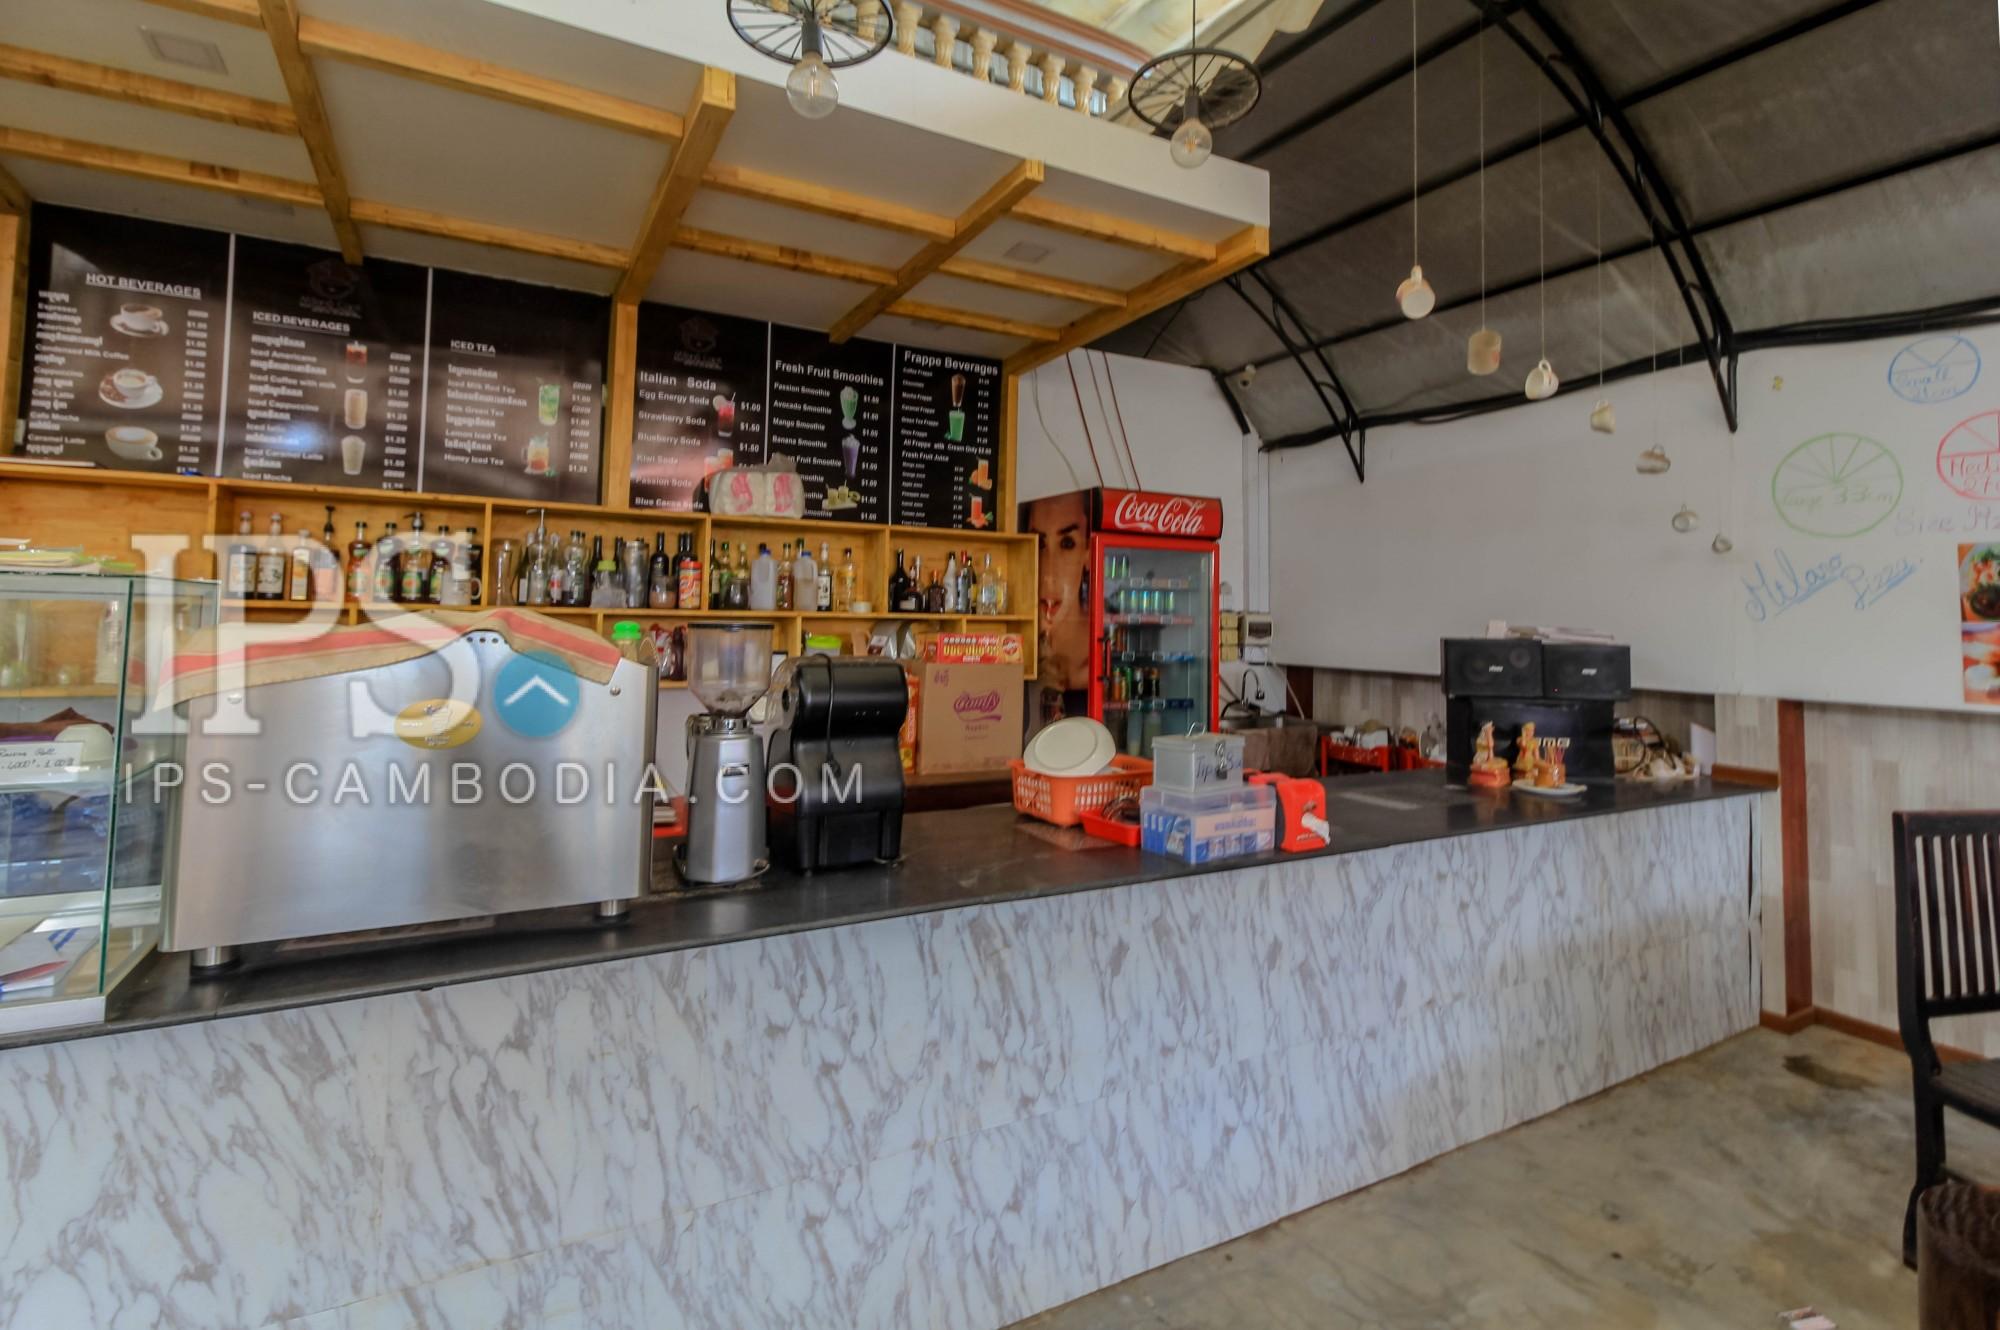 520 sqm. Restaurant Space For Rent - Sok San Road, Siem Reap